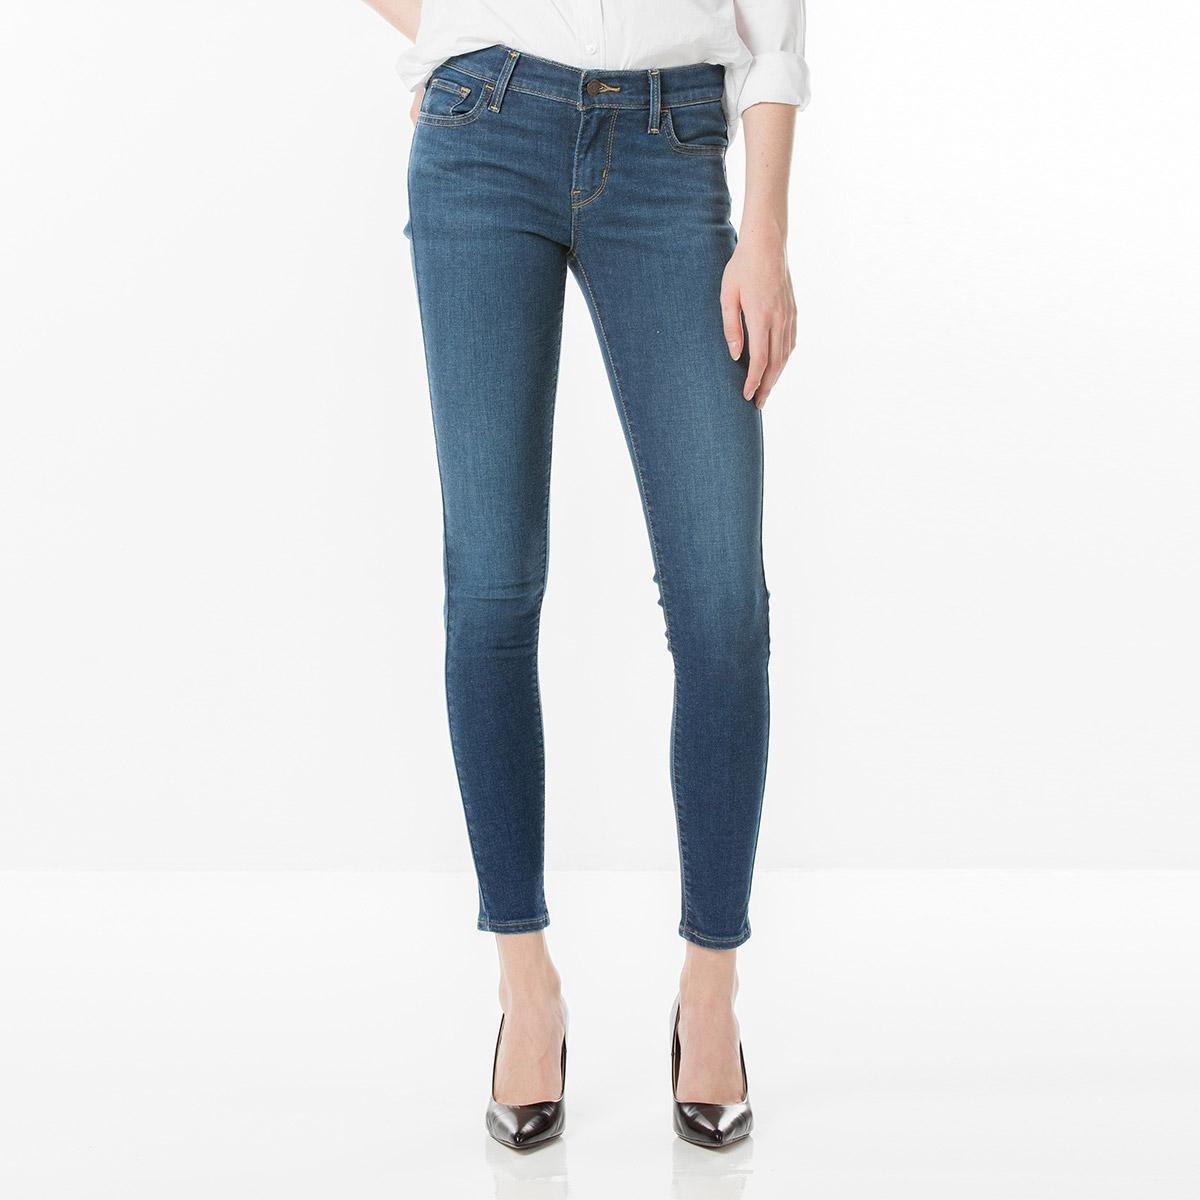 Calça Jeans 710 Super Skinny Jeans Levis Feminina - Compre Agora ... c3d17b8038d